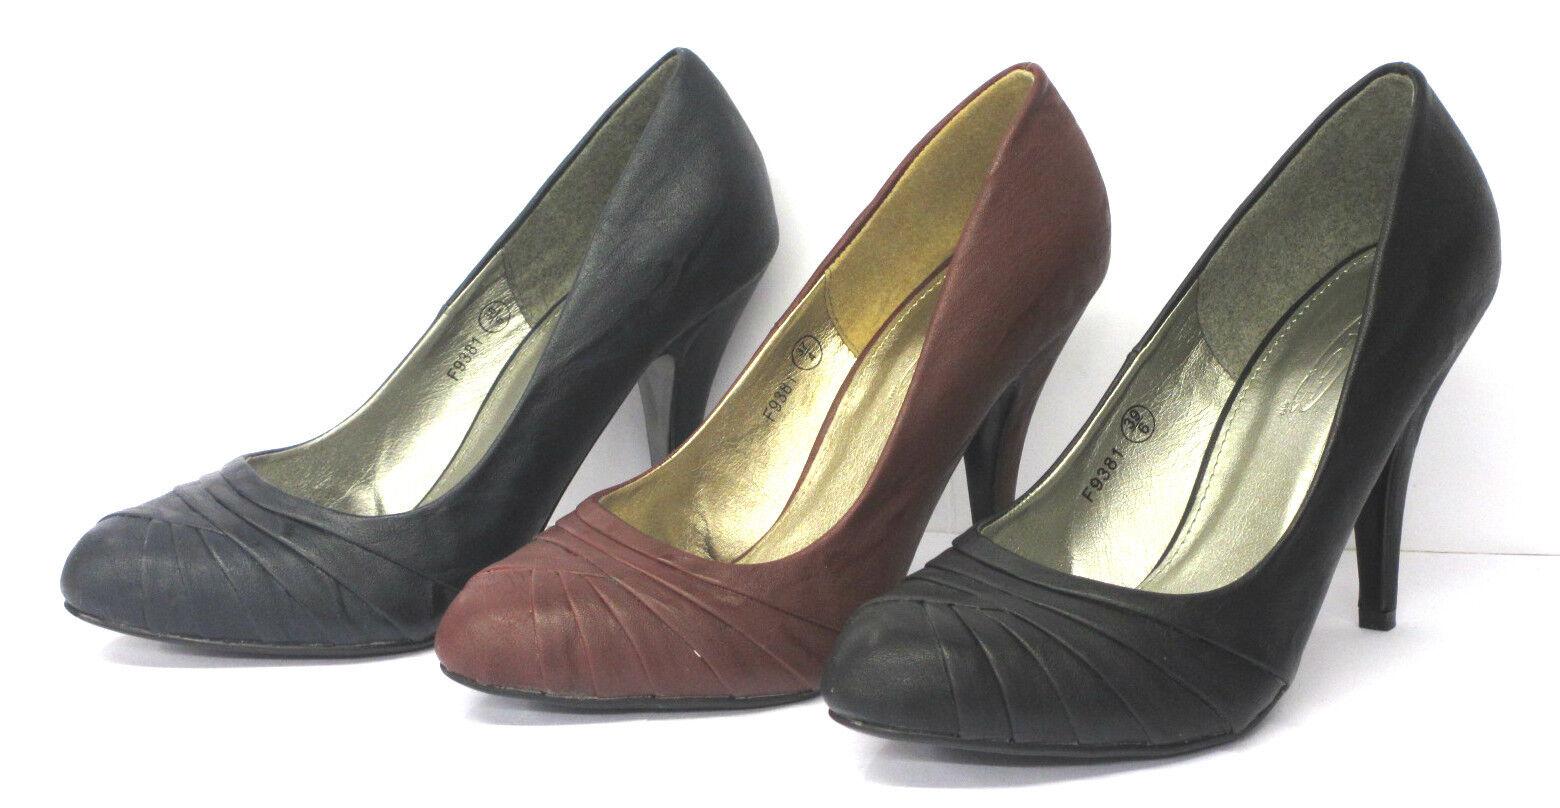 Spot on REDUZIERT Damen High Heel Pumps in verschiedenen Farben f9381